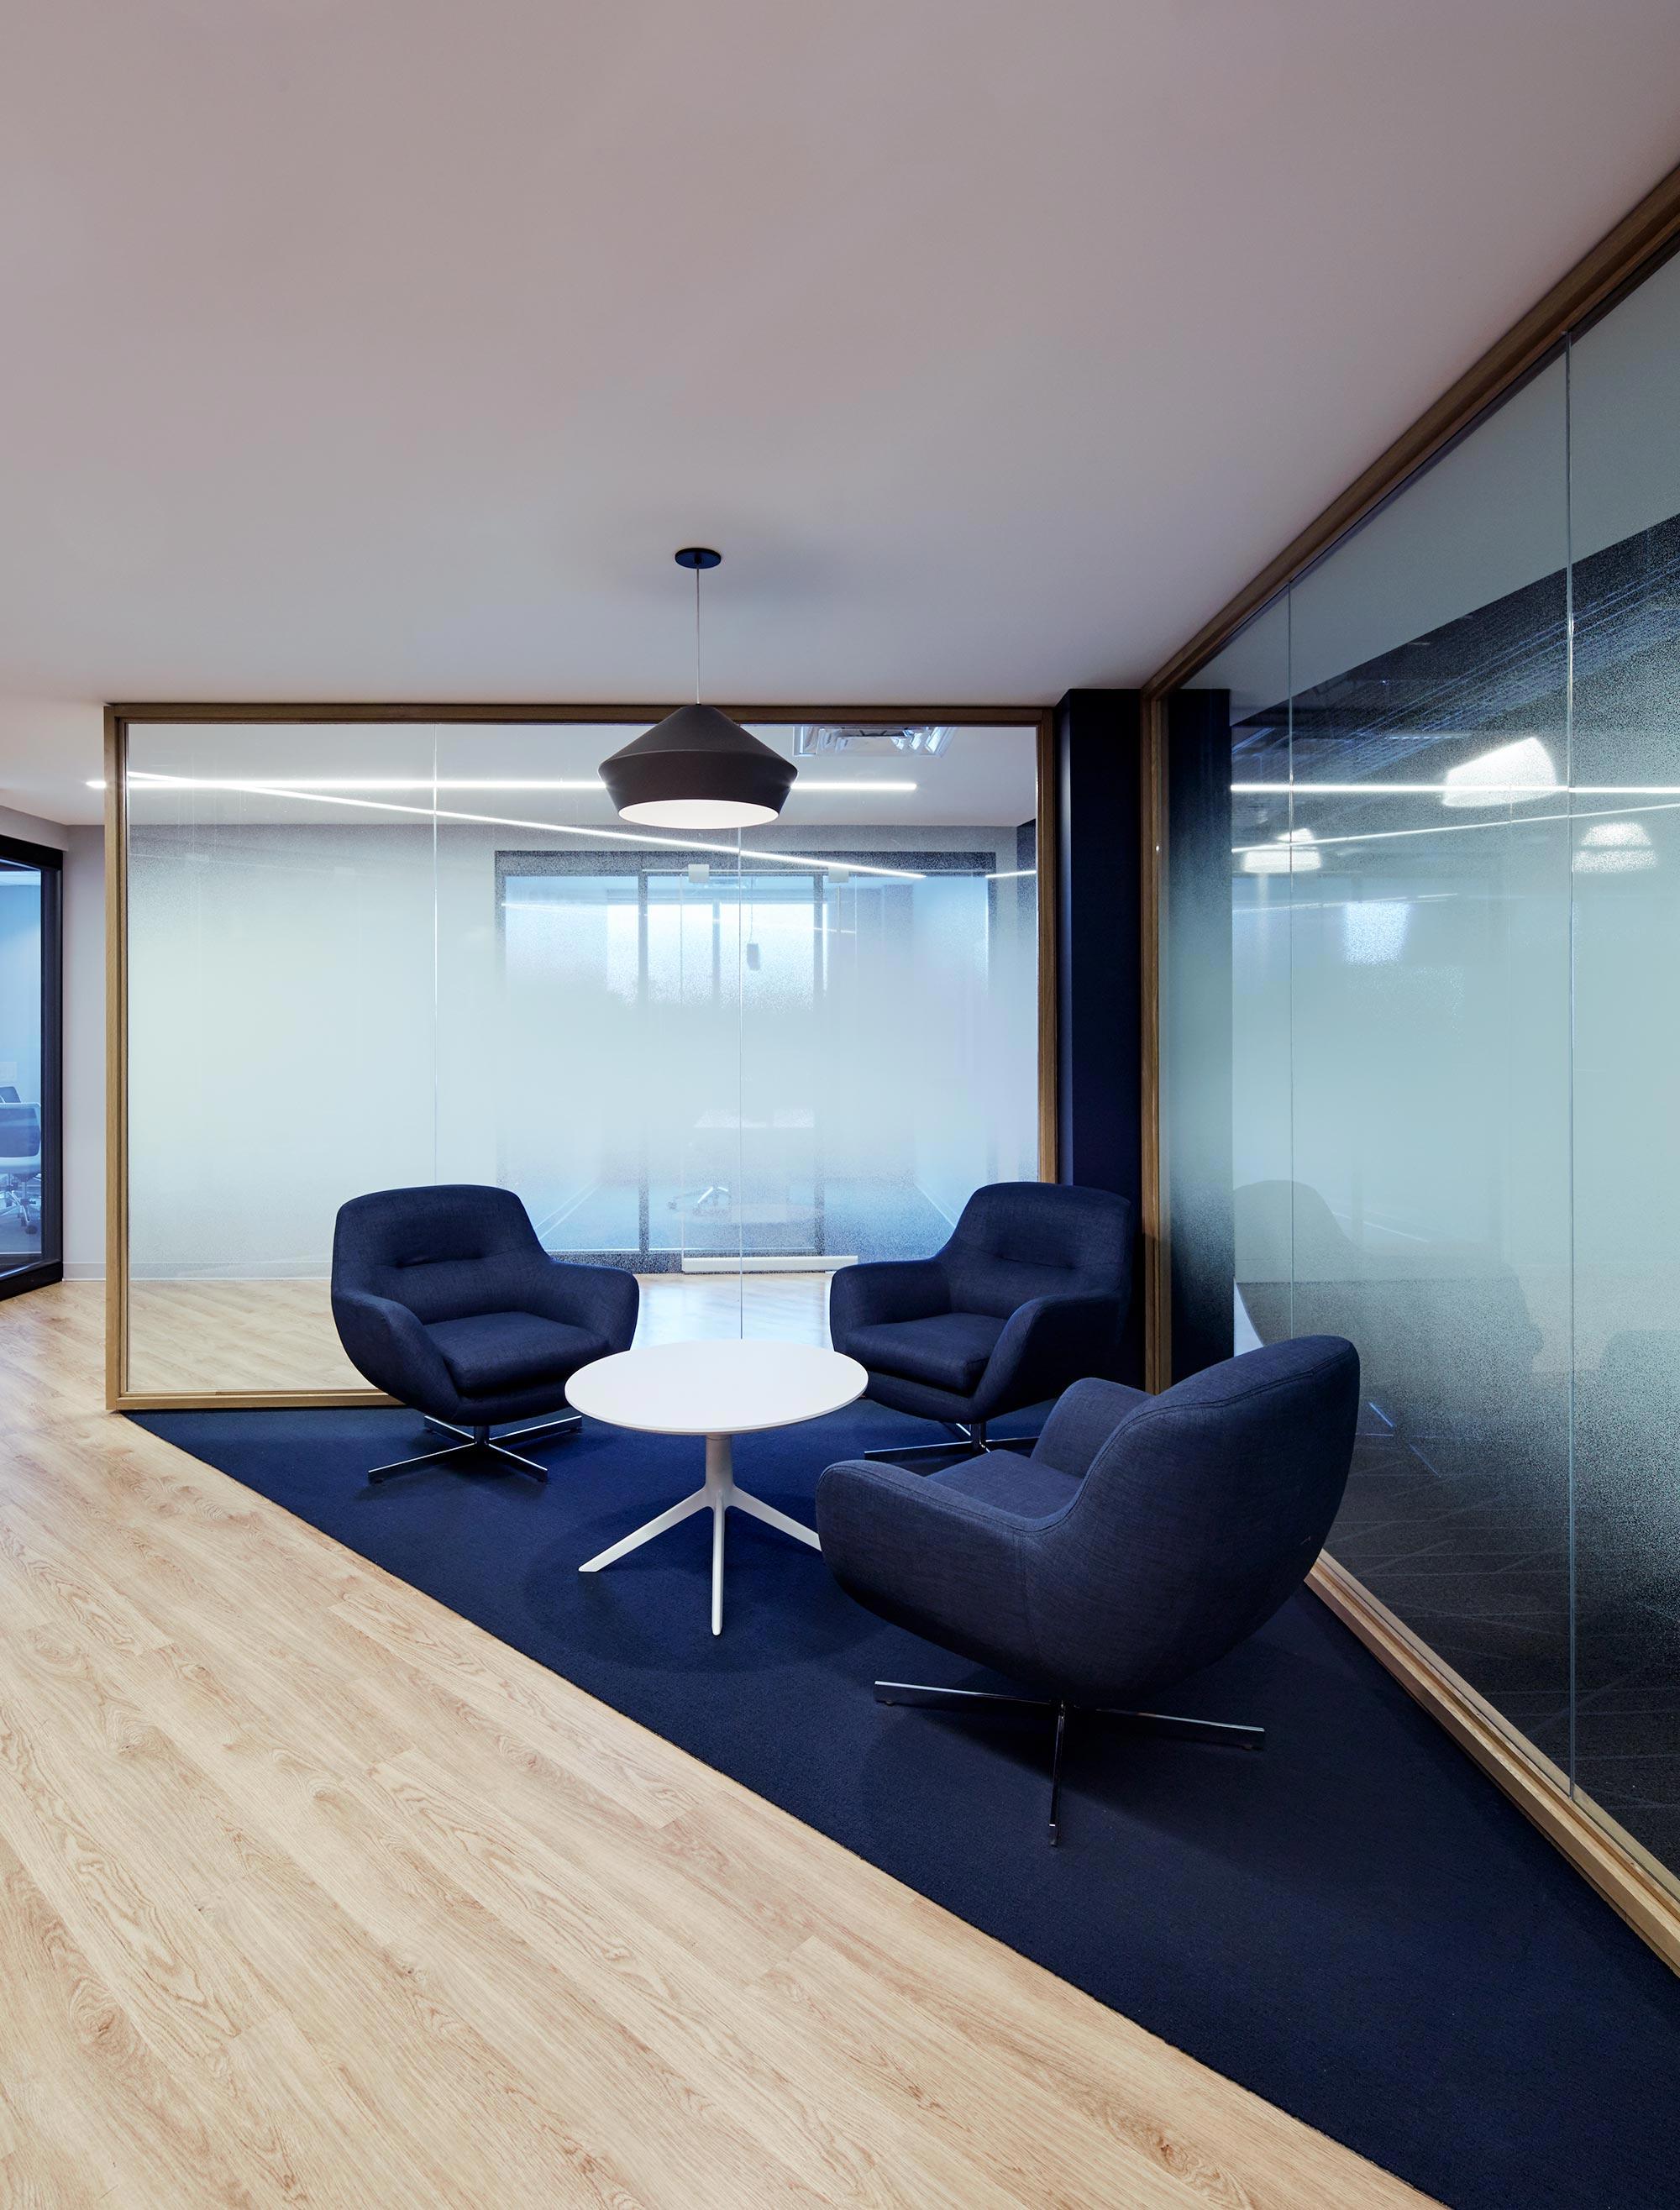 halifax-interior-design-tech-office-common-area.jpg